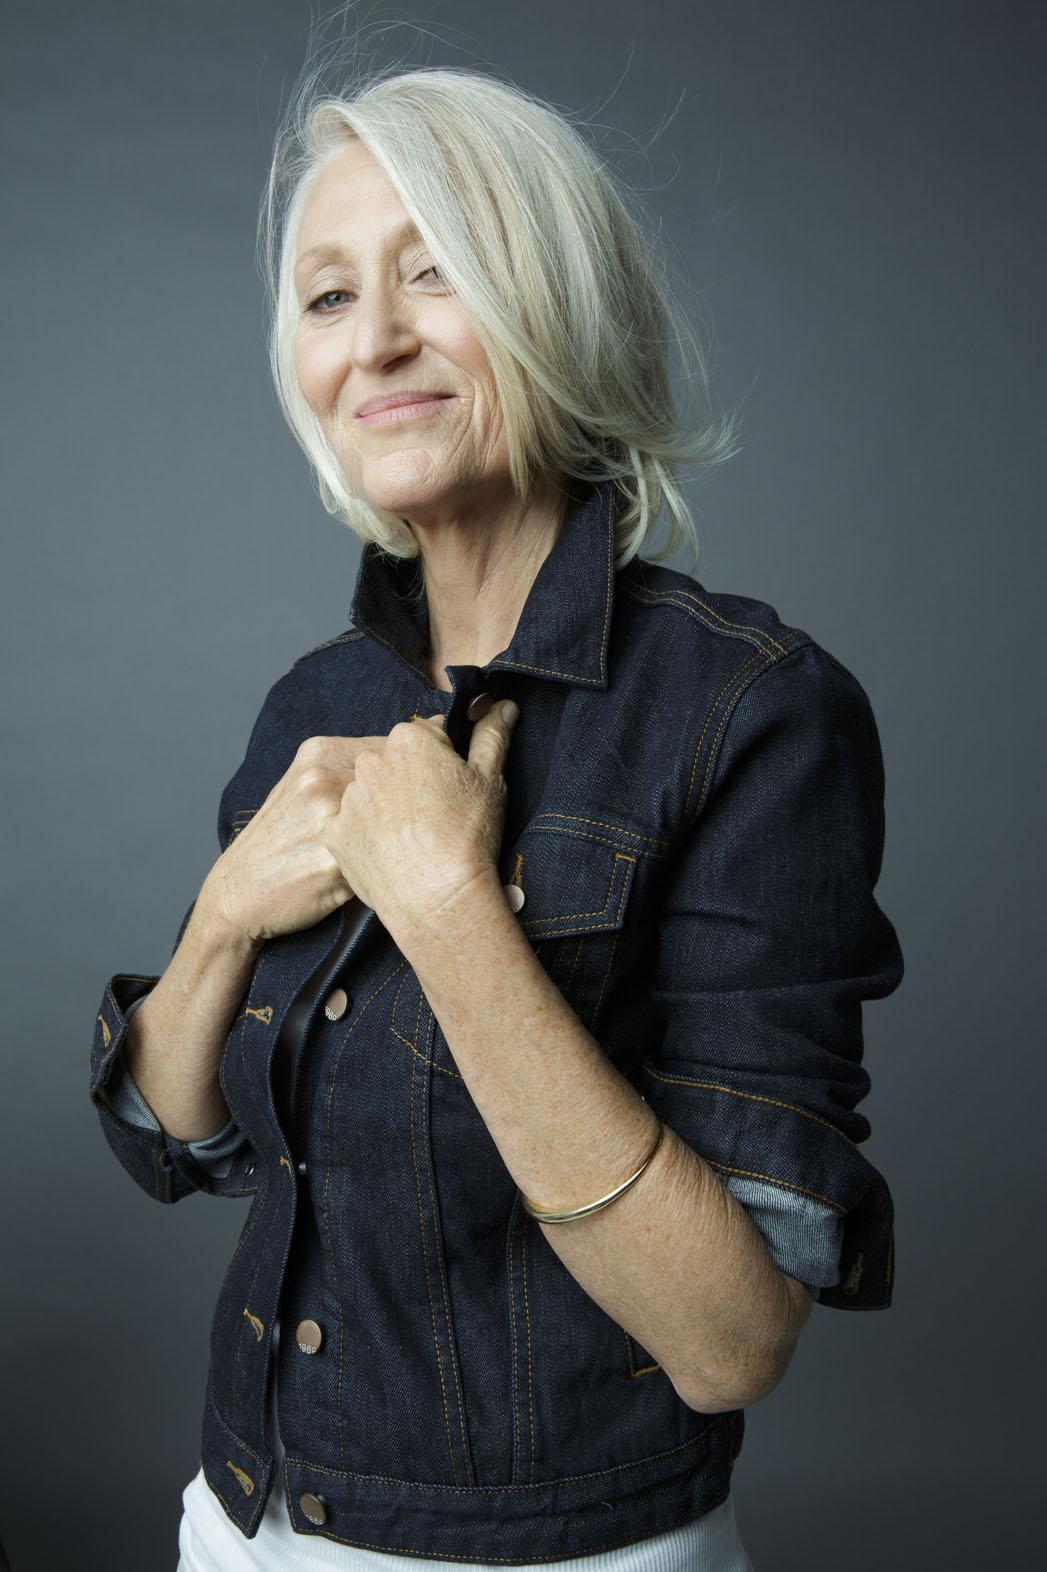 Gillean McLeod Portrait - P 2014